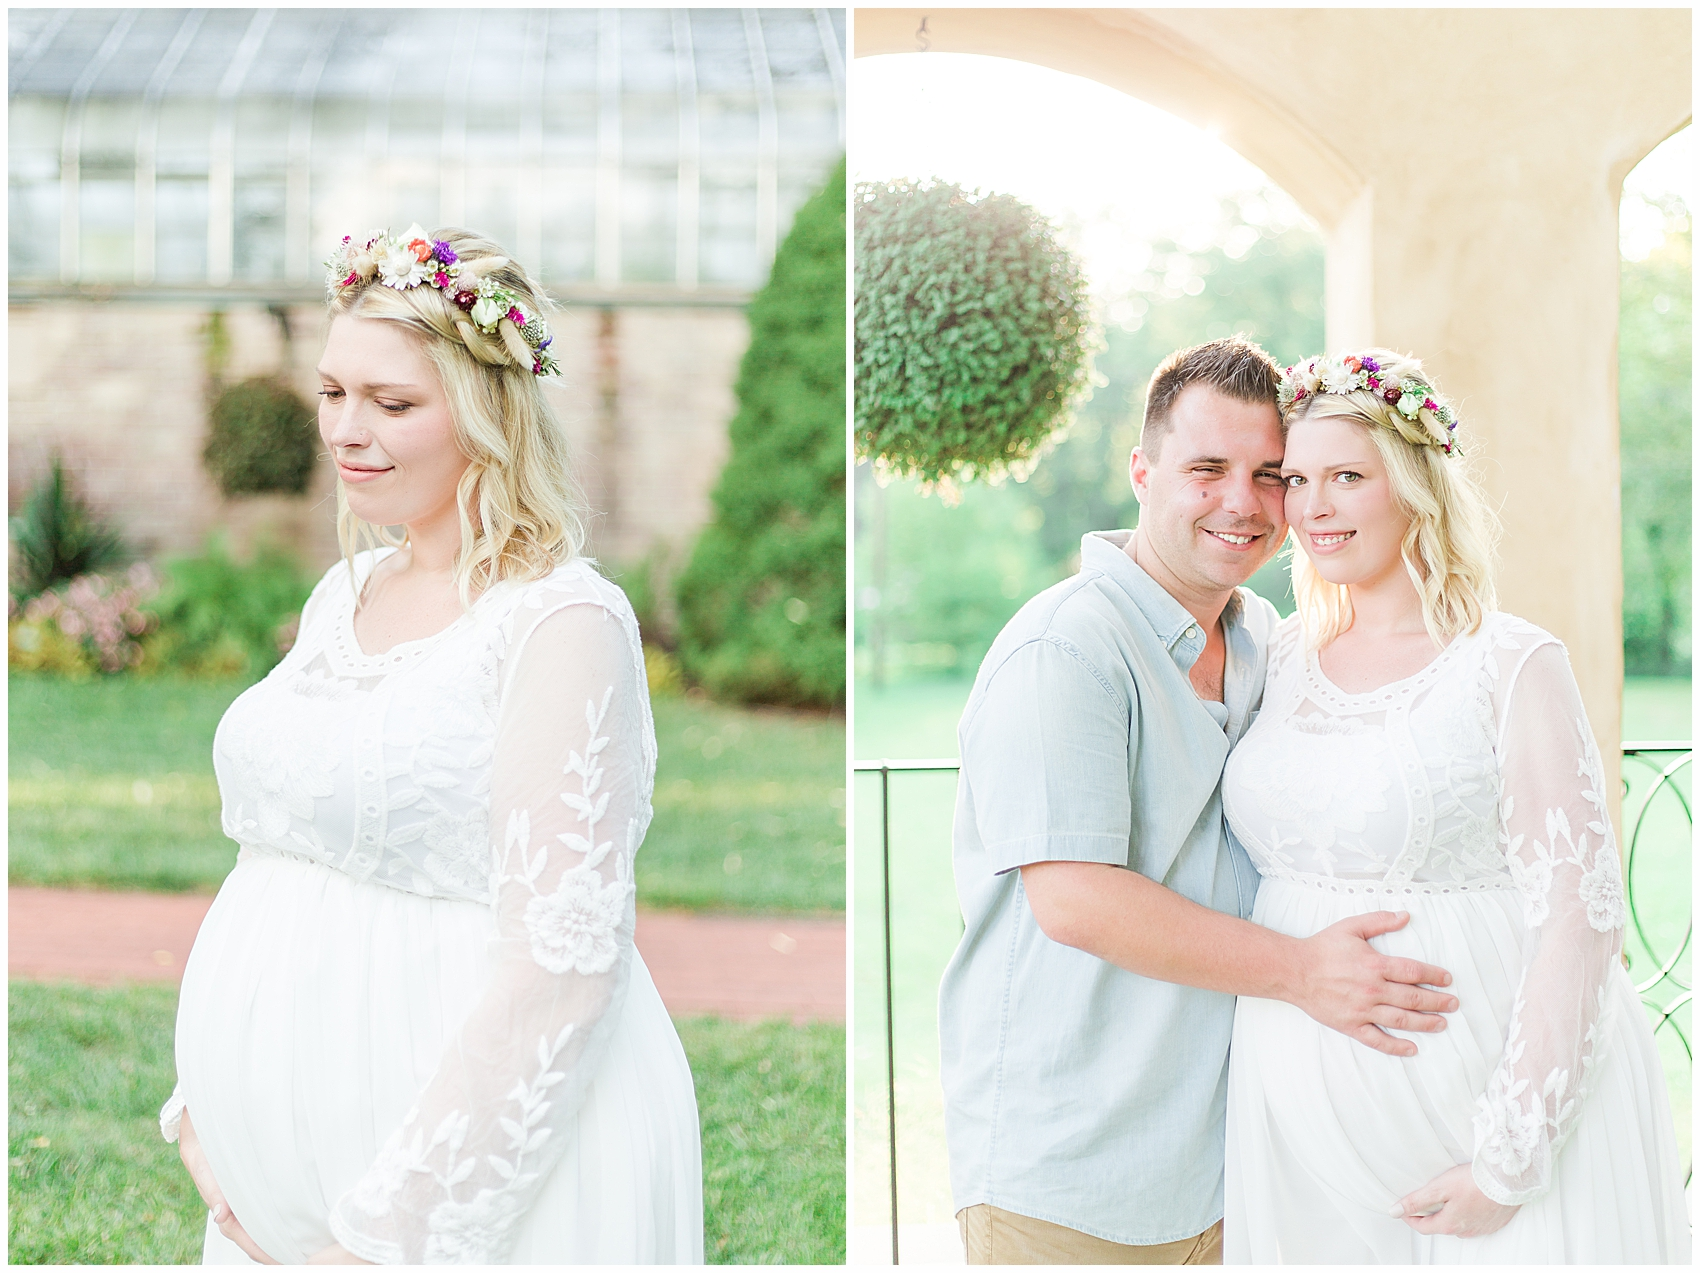 lancaster-pa-maternity-photographer-14.jpg